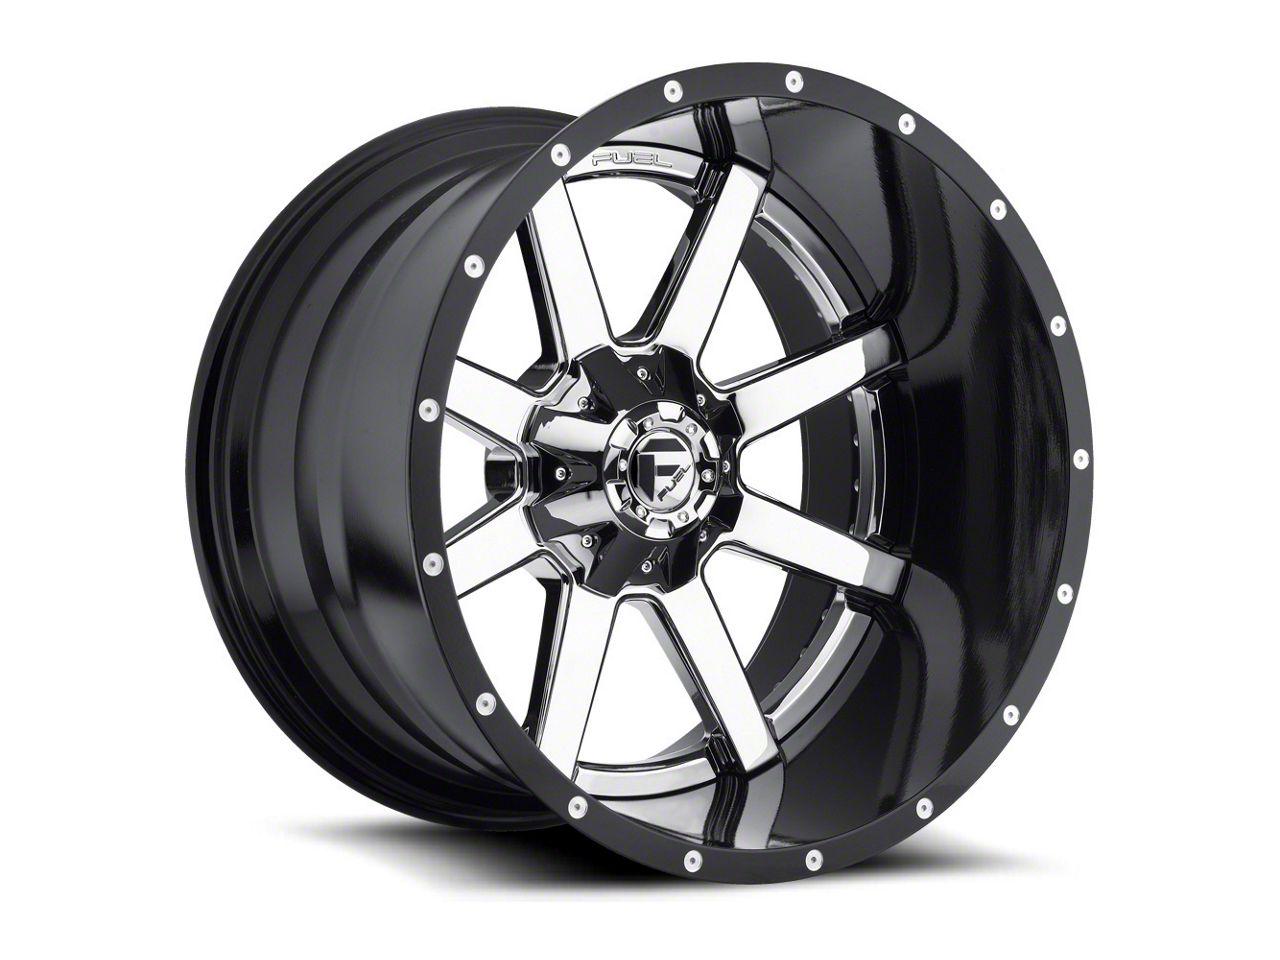 Fuel Wheels Maverick Chrome 6-Lug Wheel - 24x12 (07-18 Sierra 1500)